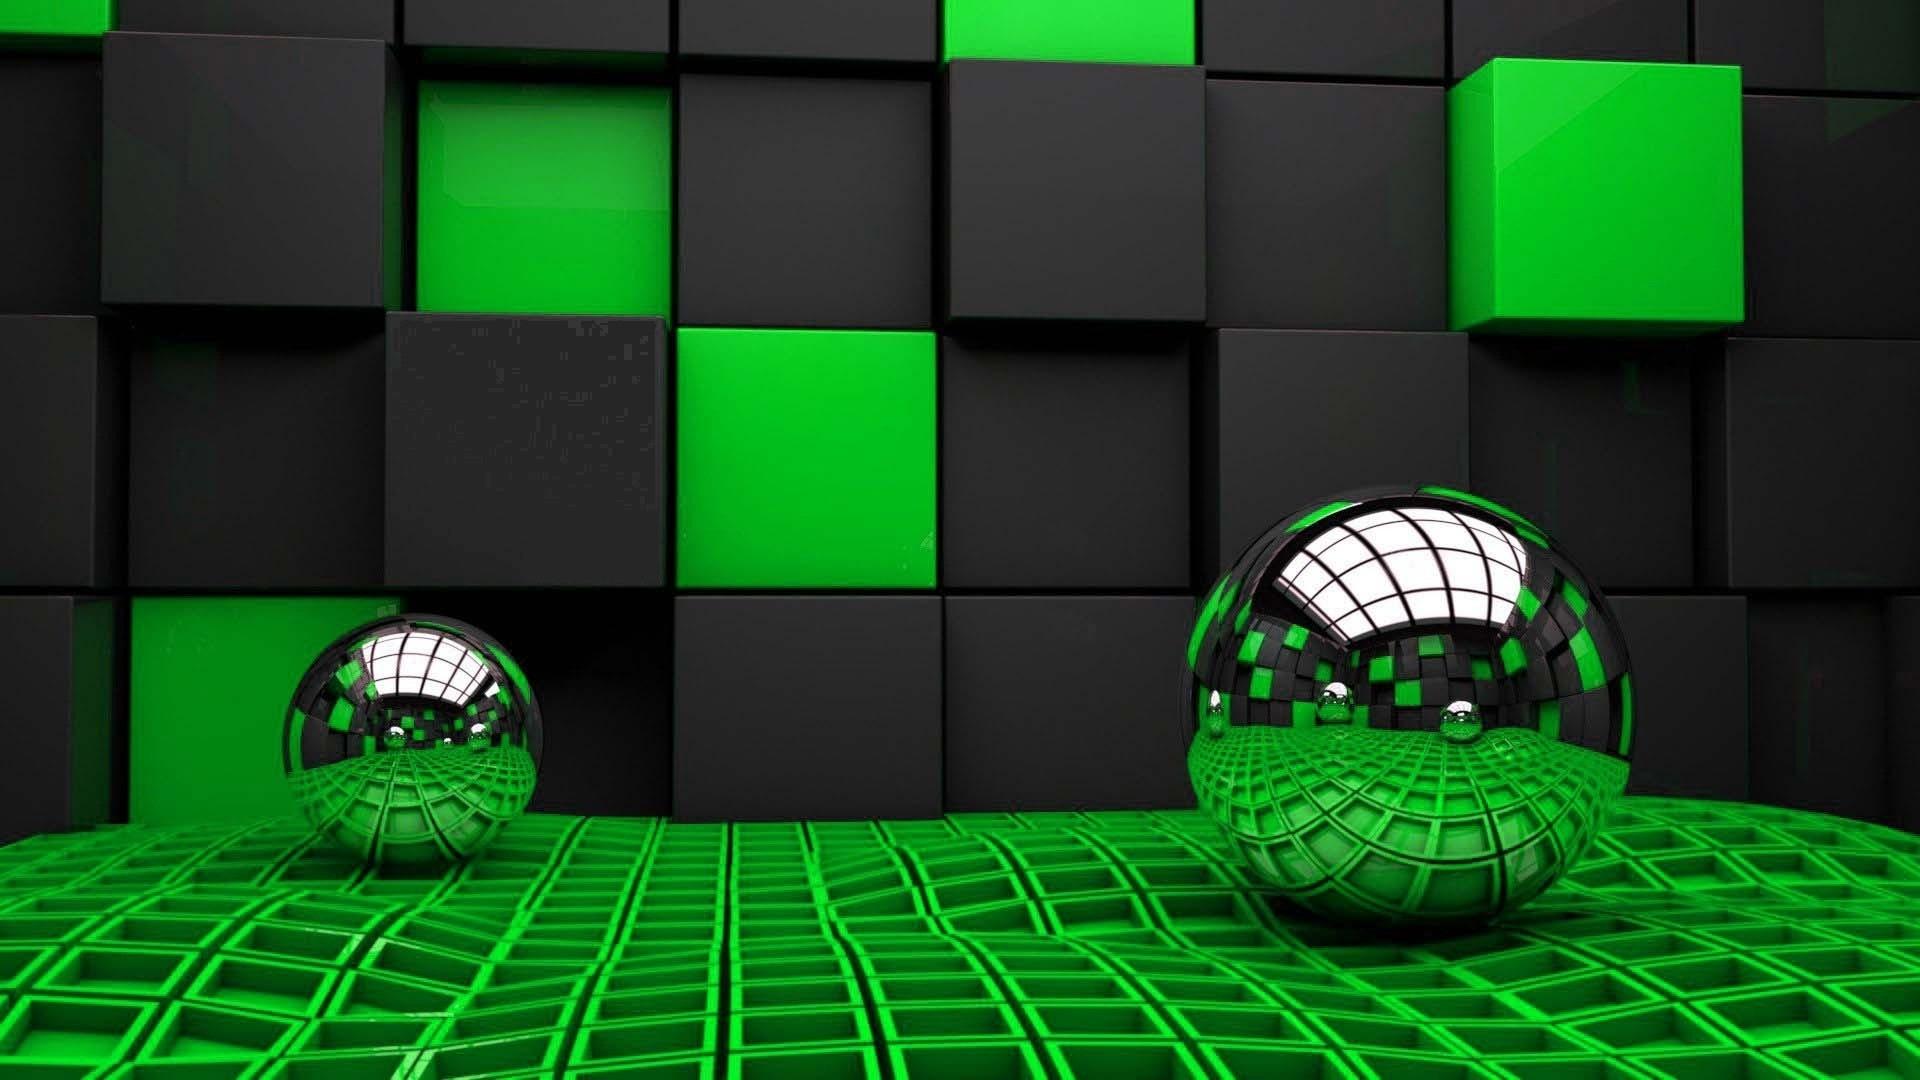 Res: 1920x1080, green and black wallpaper hd black abstract green glow desktop wallpaper  59476008